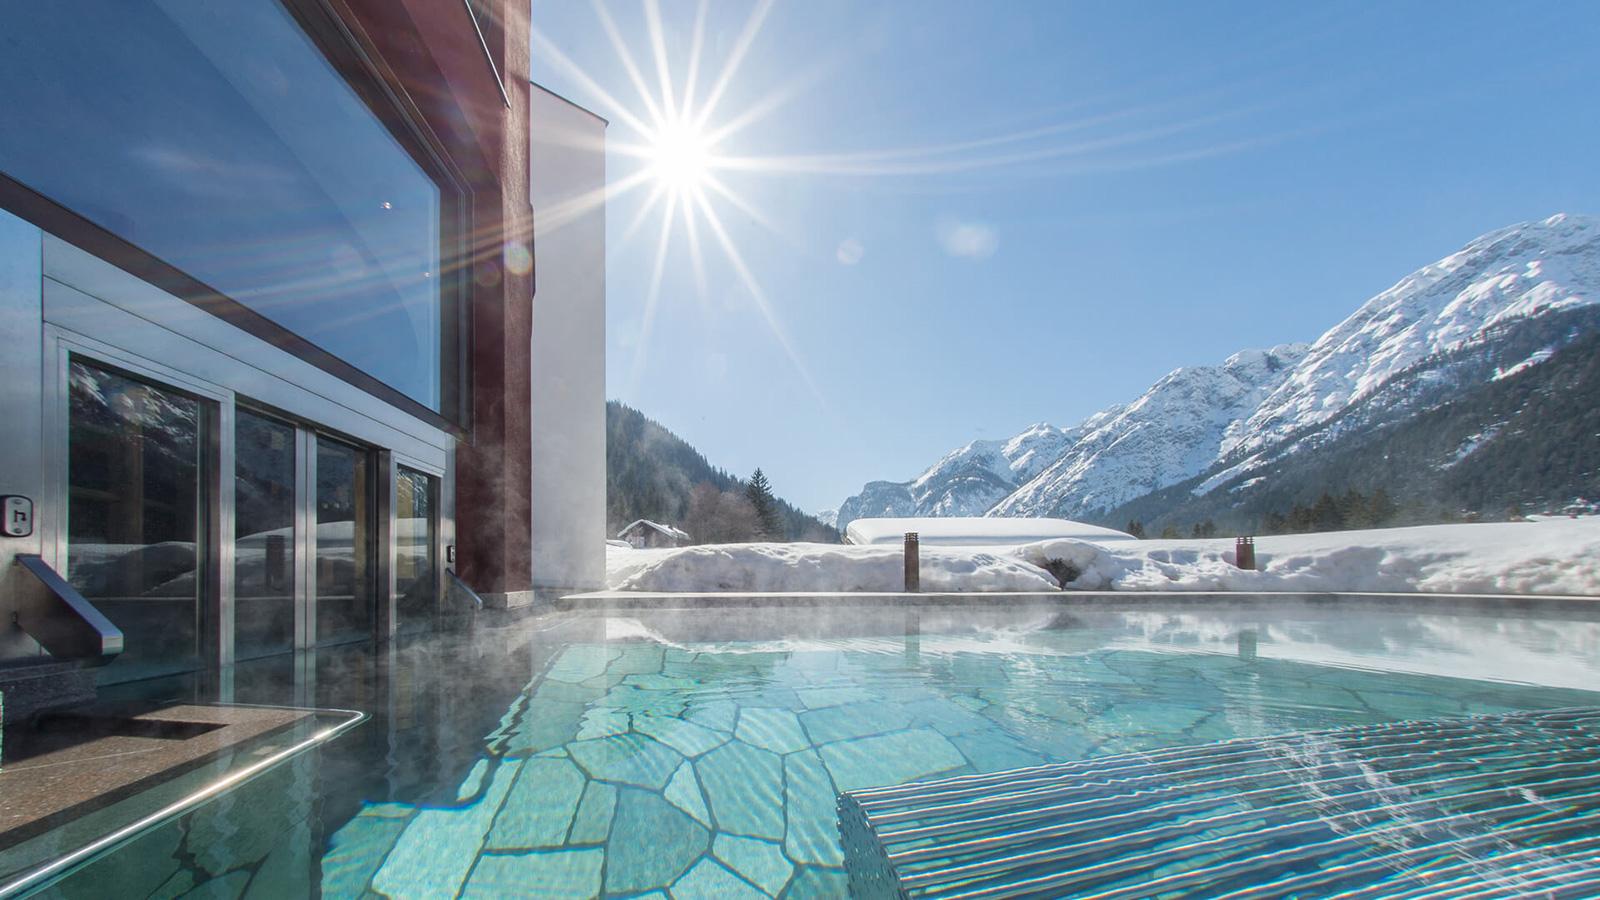 Hotel santer - Hotel dobbiaco con piscina ...